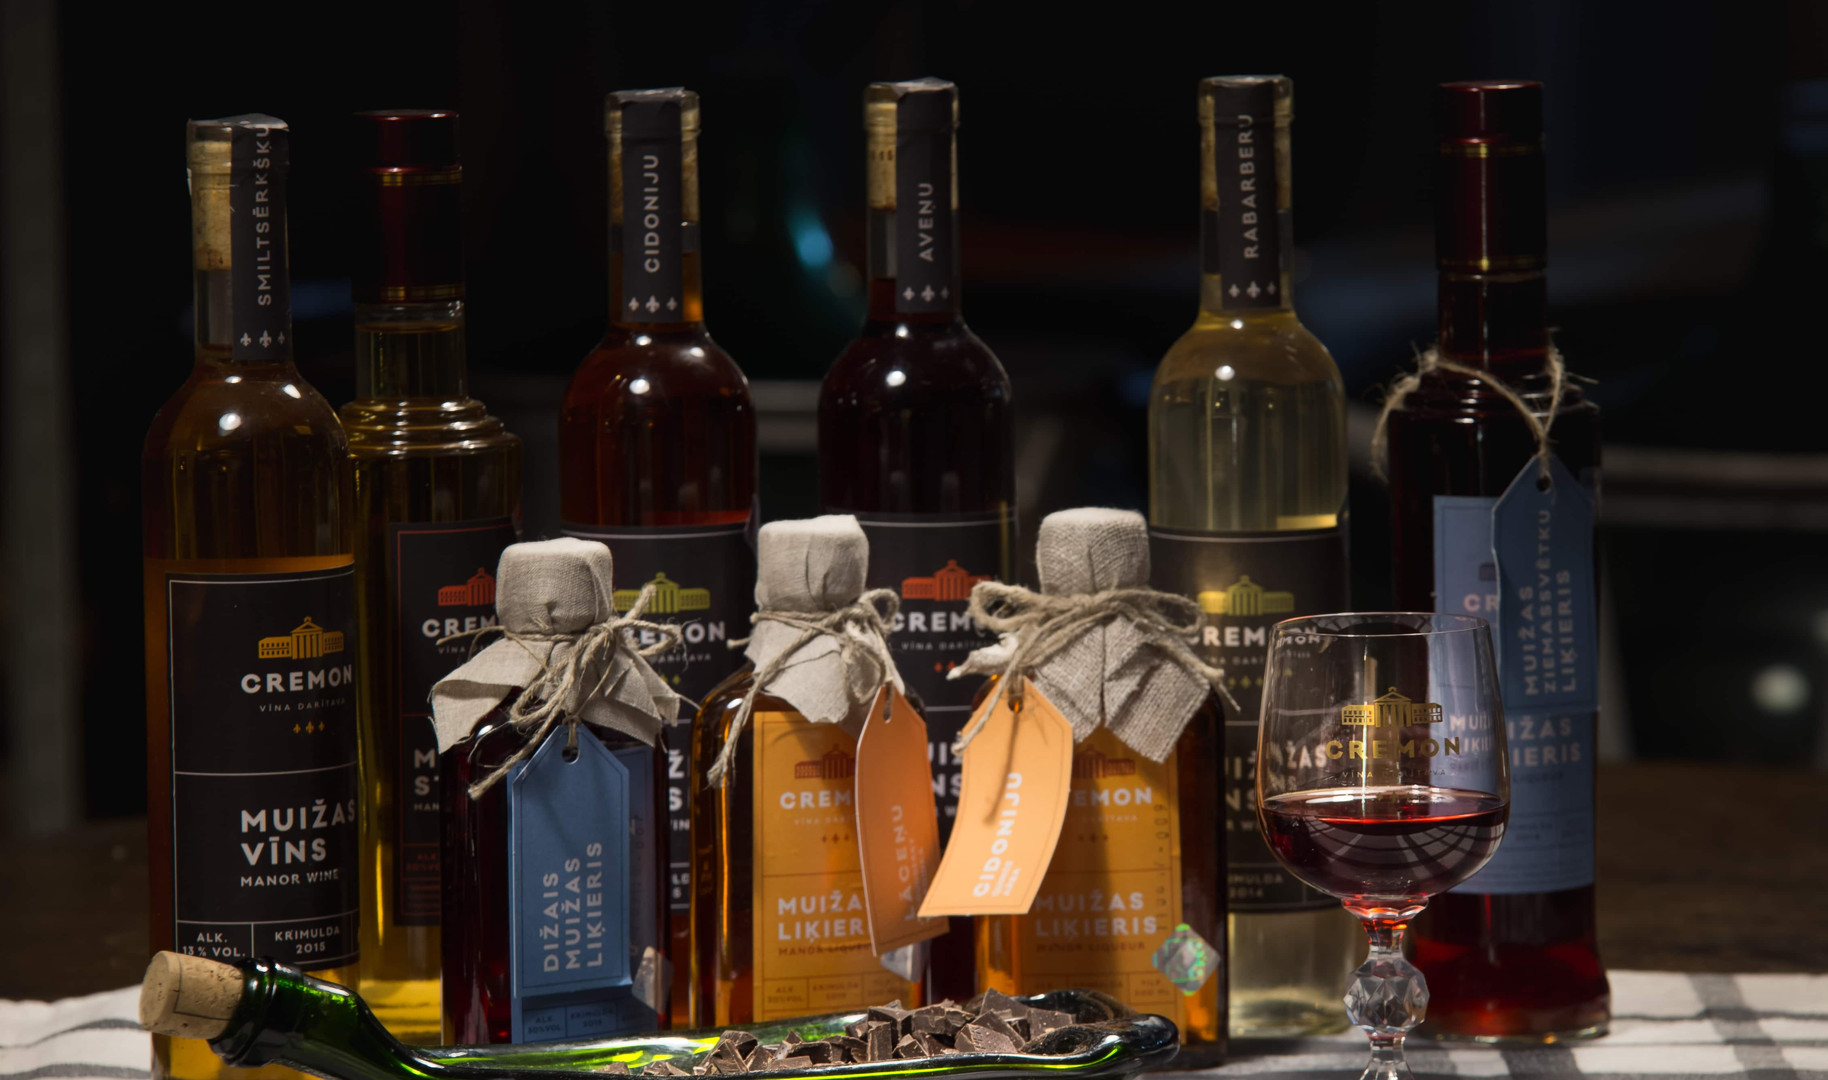 Krimulda Winery